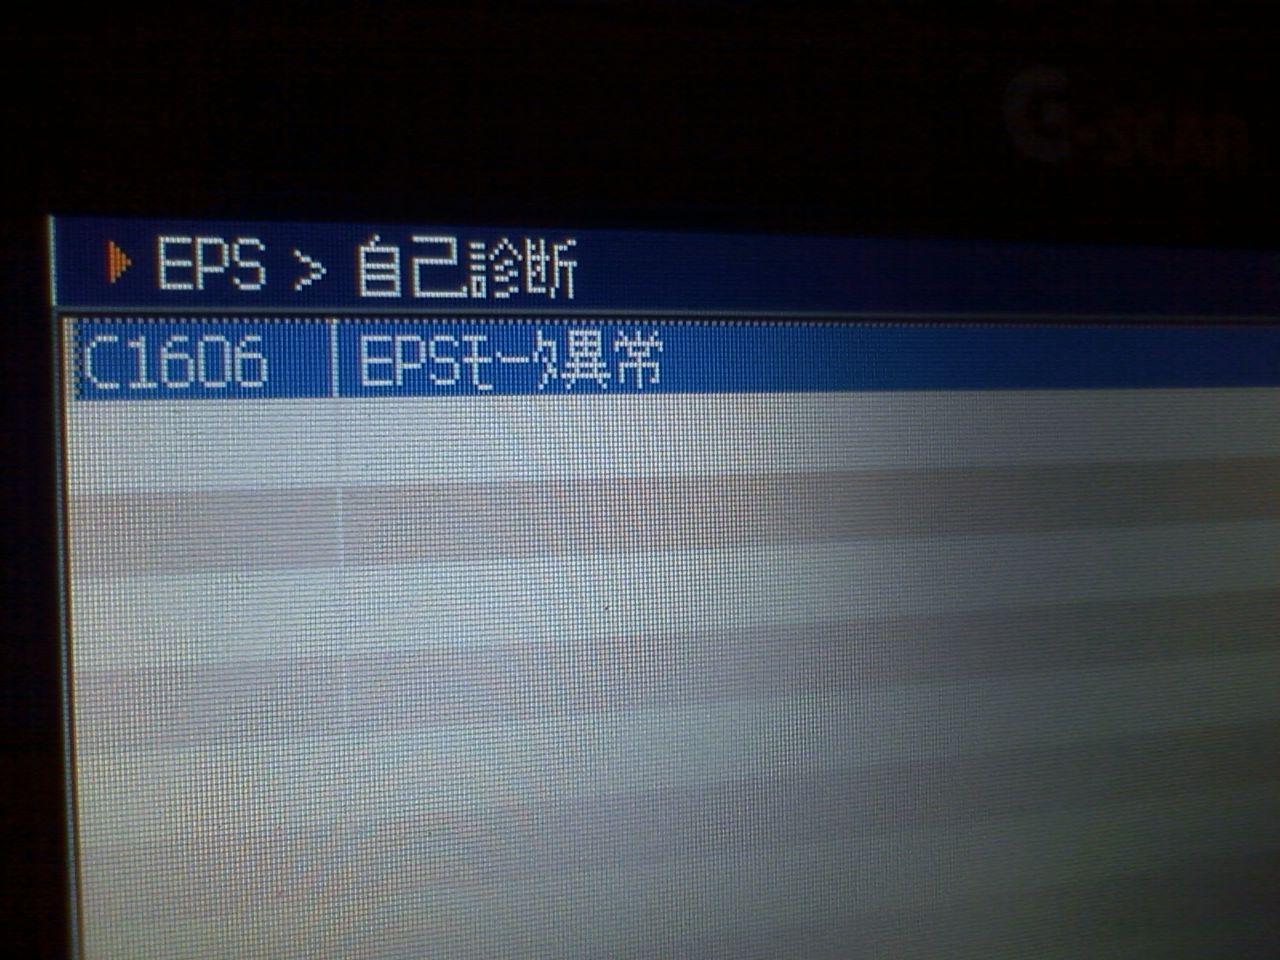 PAP_0338.jpg